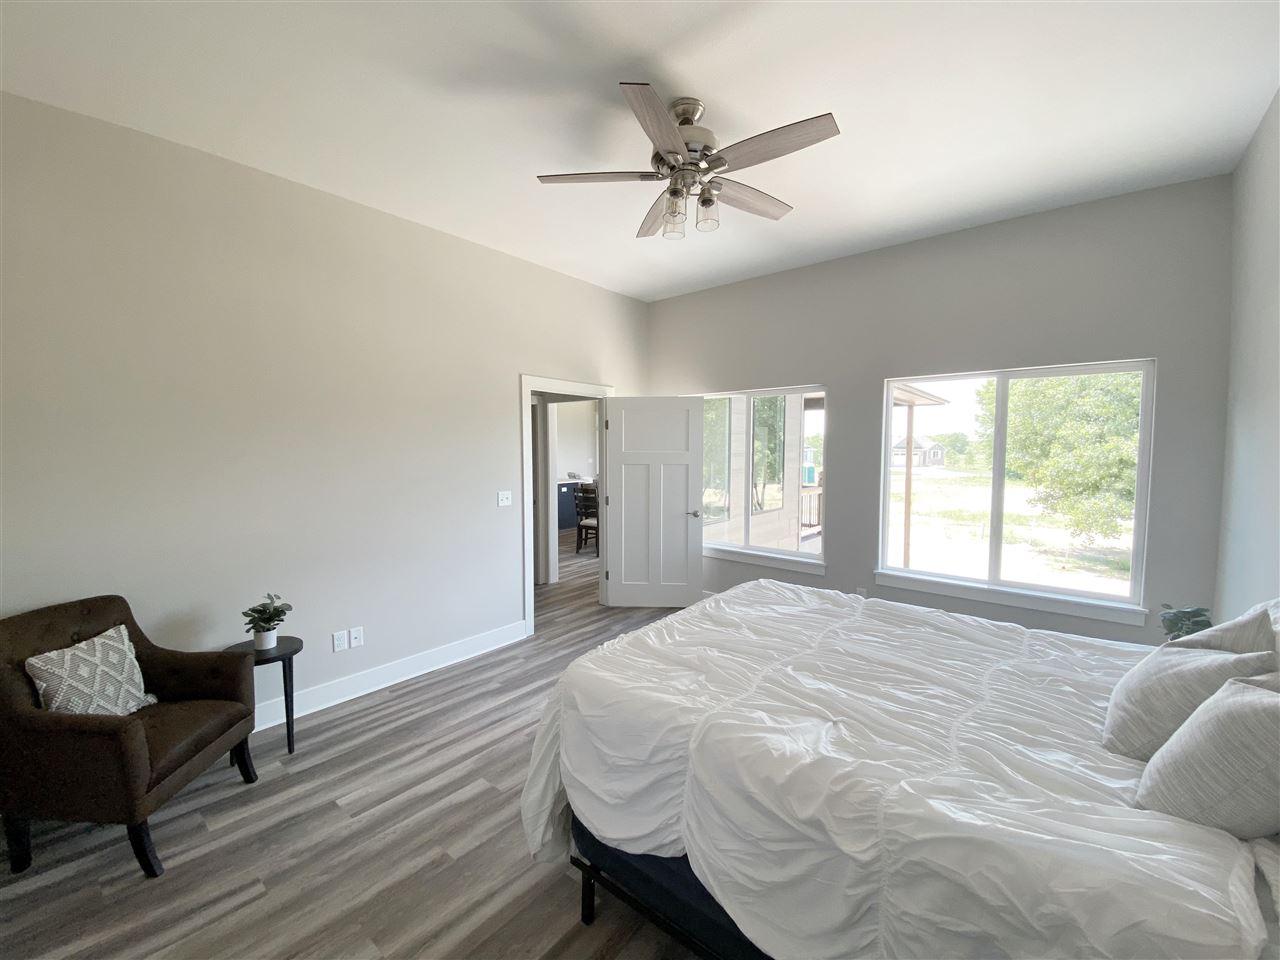 For Sale: 2854 W 58th St. N., Wichita, KS 67204,